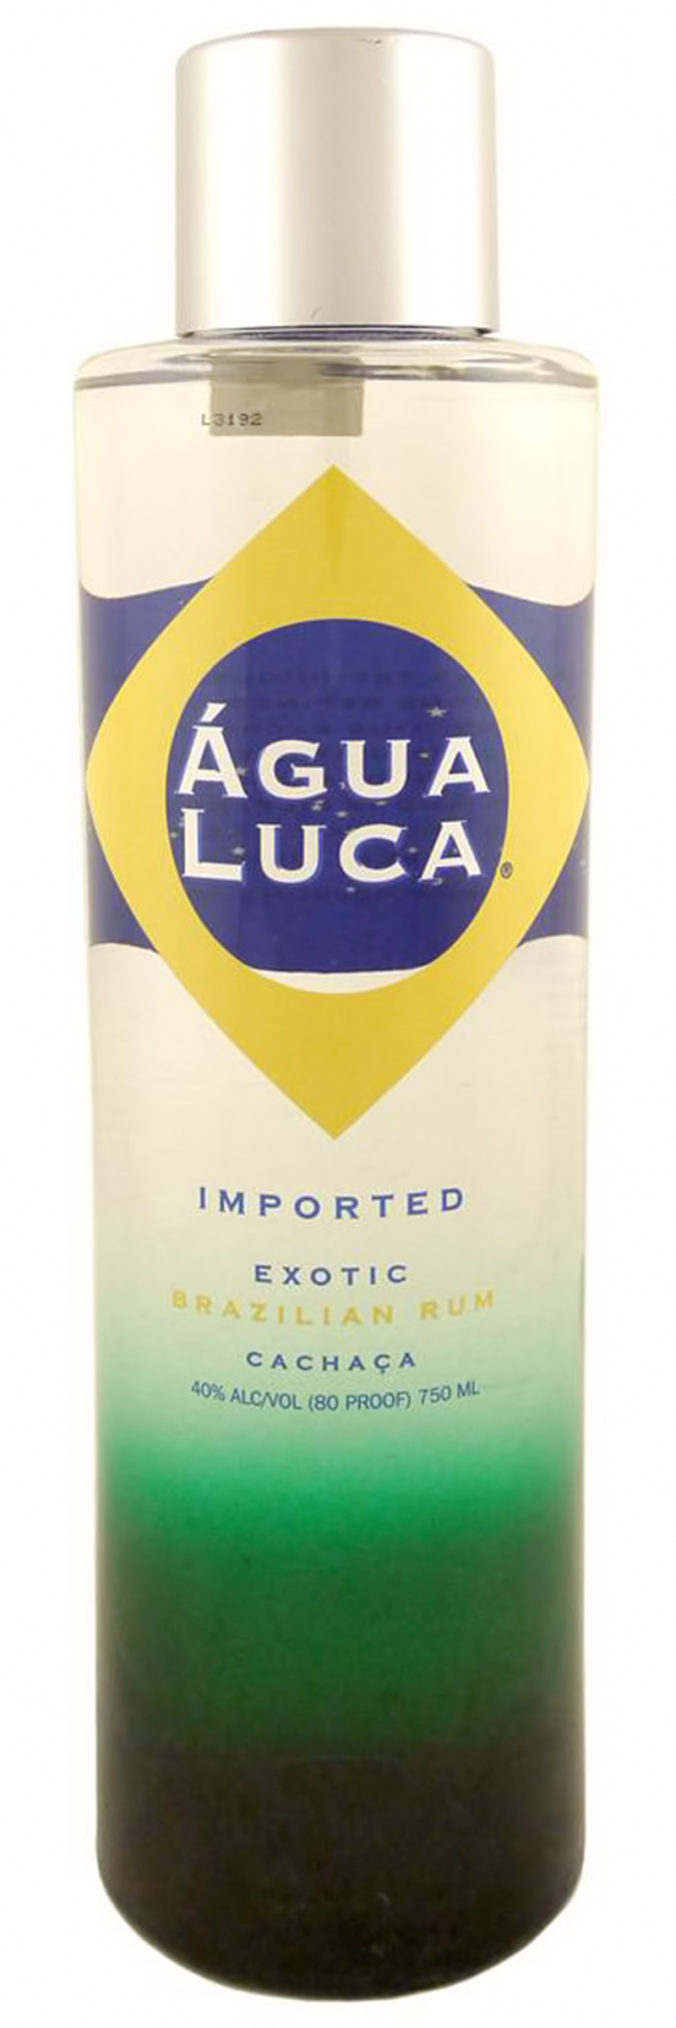 Agua Luca cachaça from Brazil